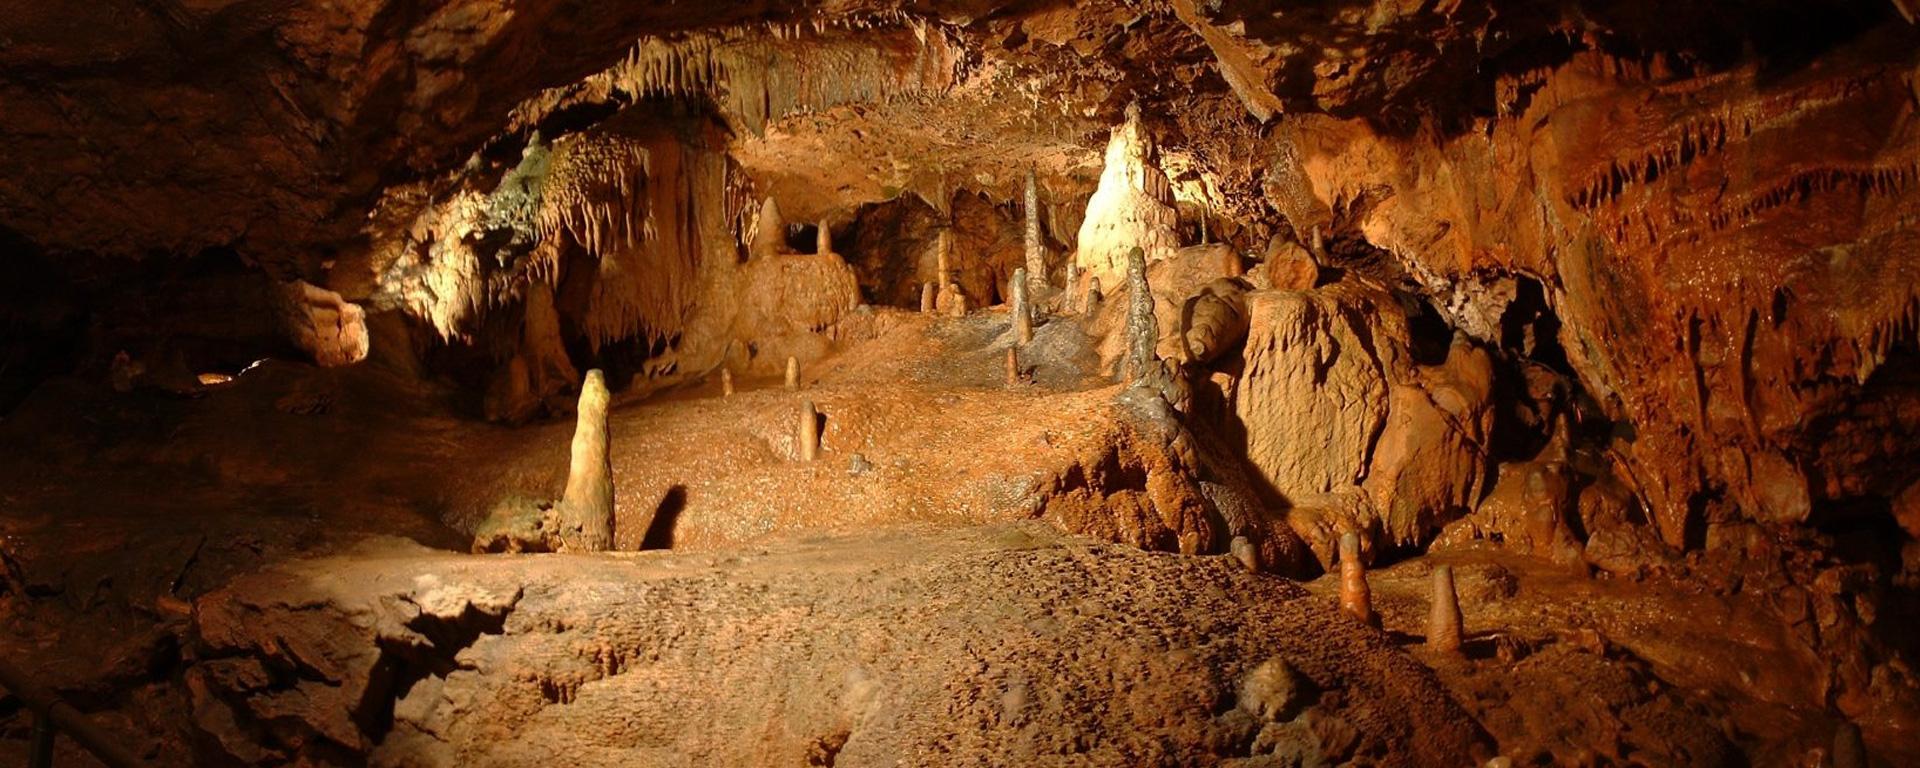 Kents Cavern - Devon, England